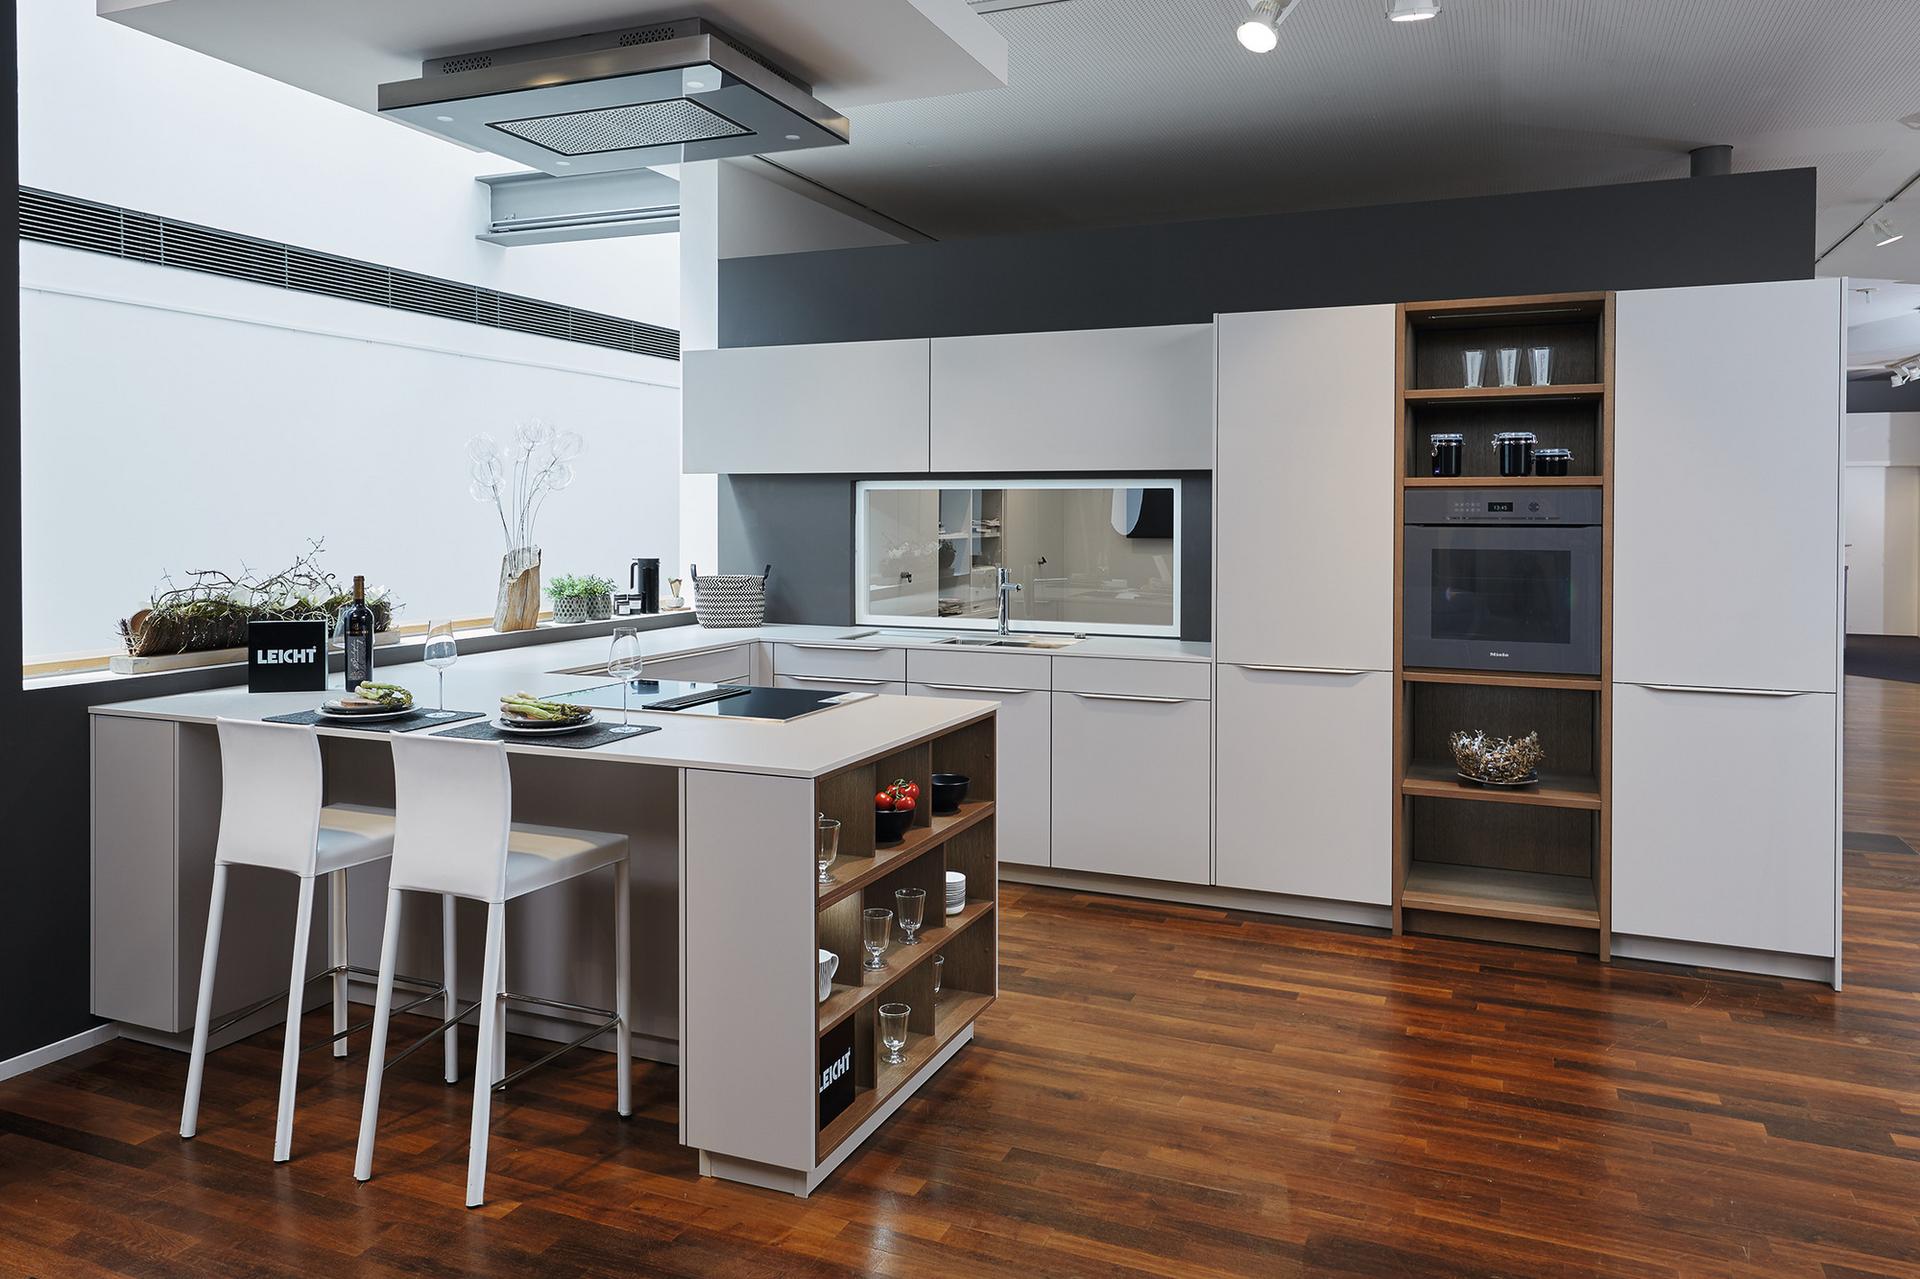 Küchenatelier Halle der Kreation WeberHaus World of Living